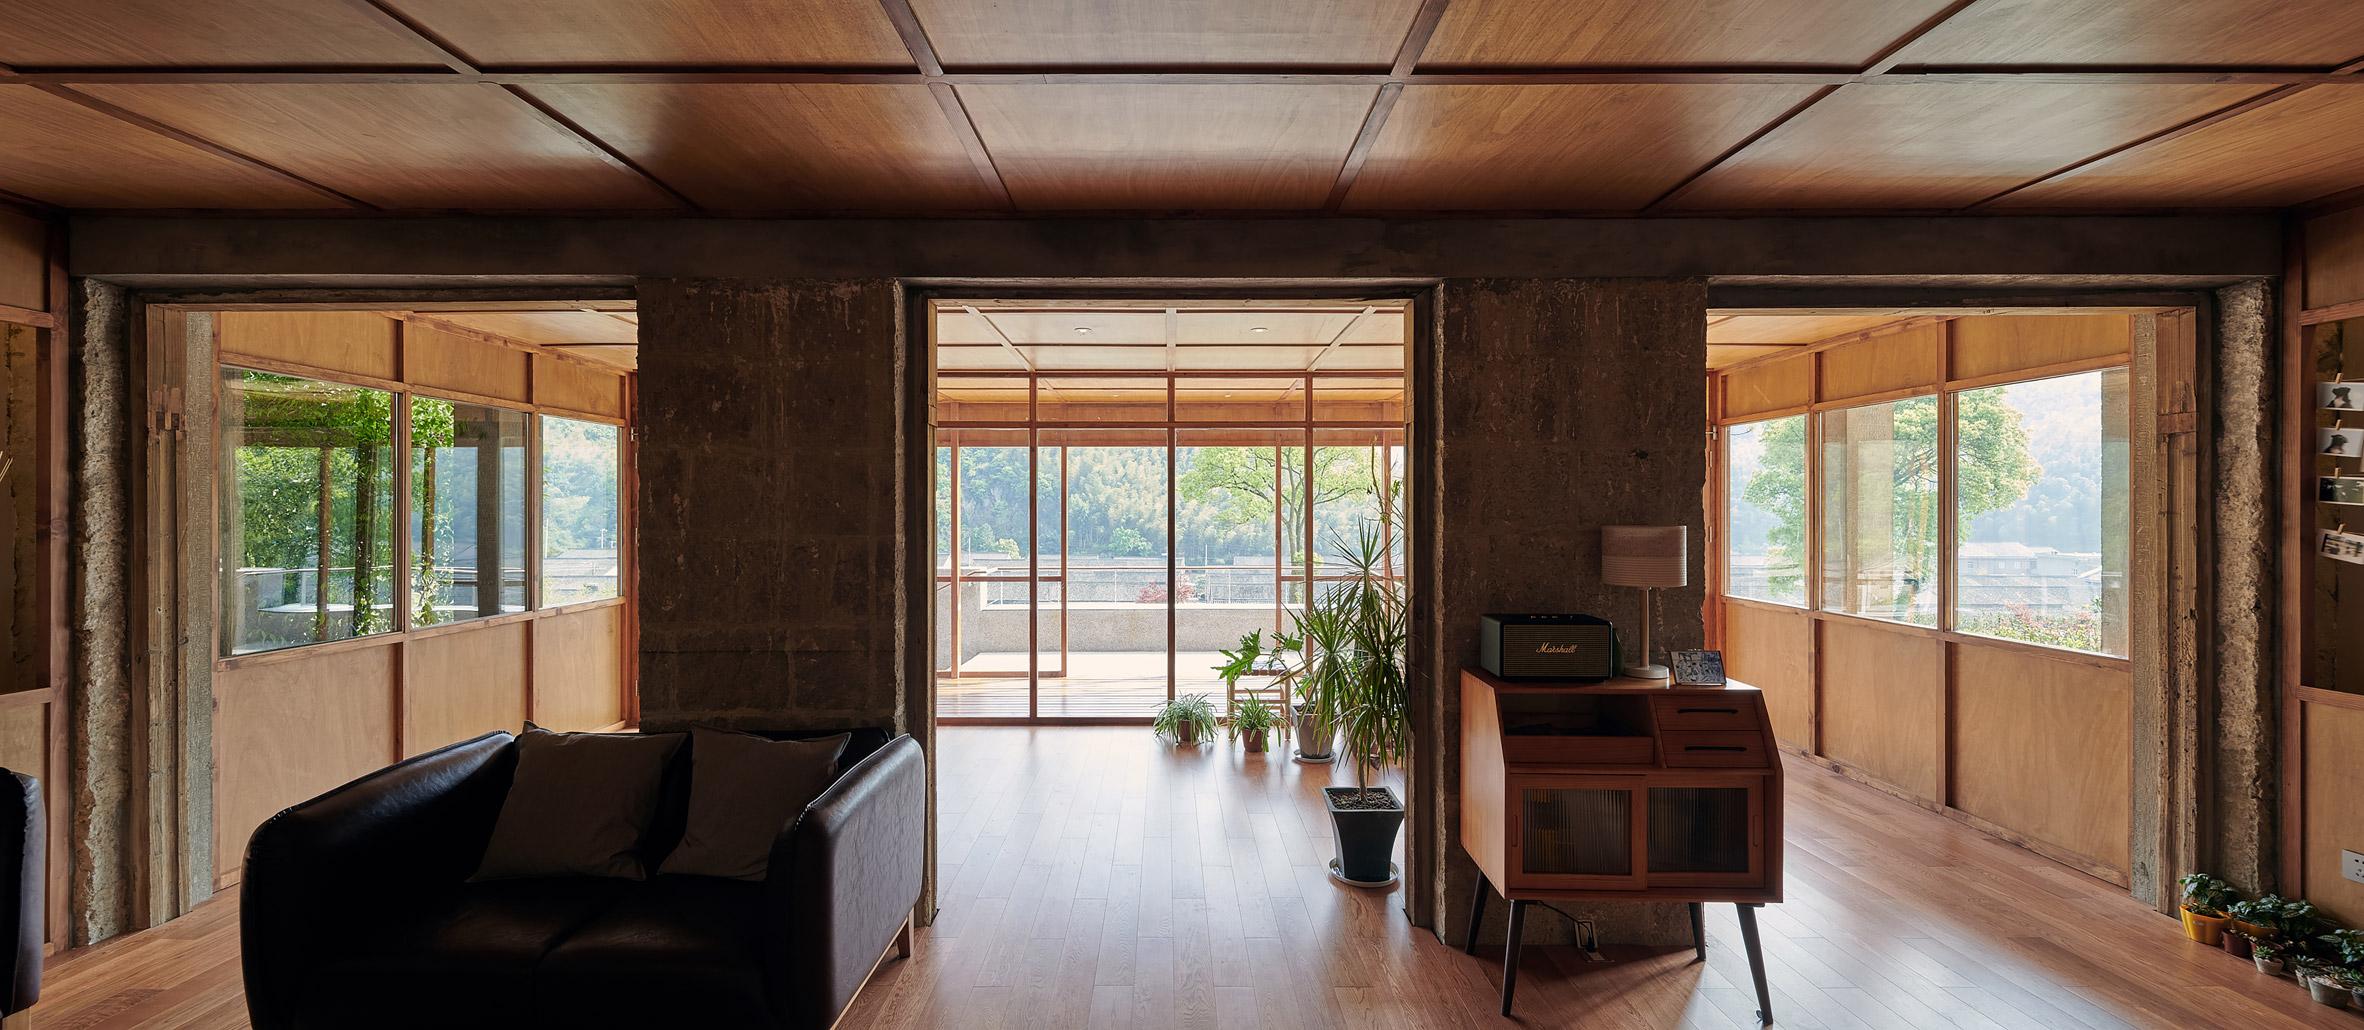 BERMALAM DI RUANG KELAS DSGNTALK ARCHITECTURE DESIGN INTERIOR CHINA HOTEL SCHOOL 6